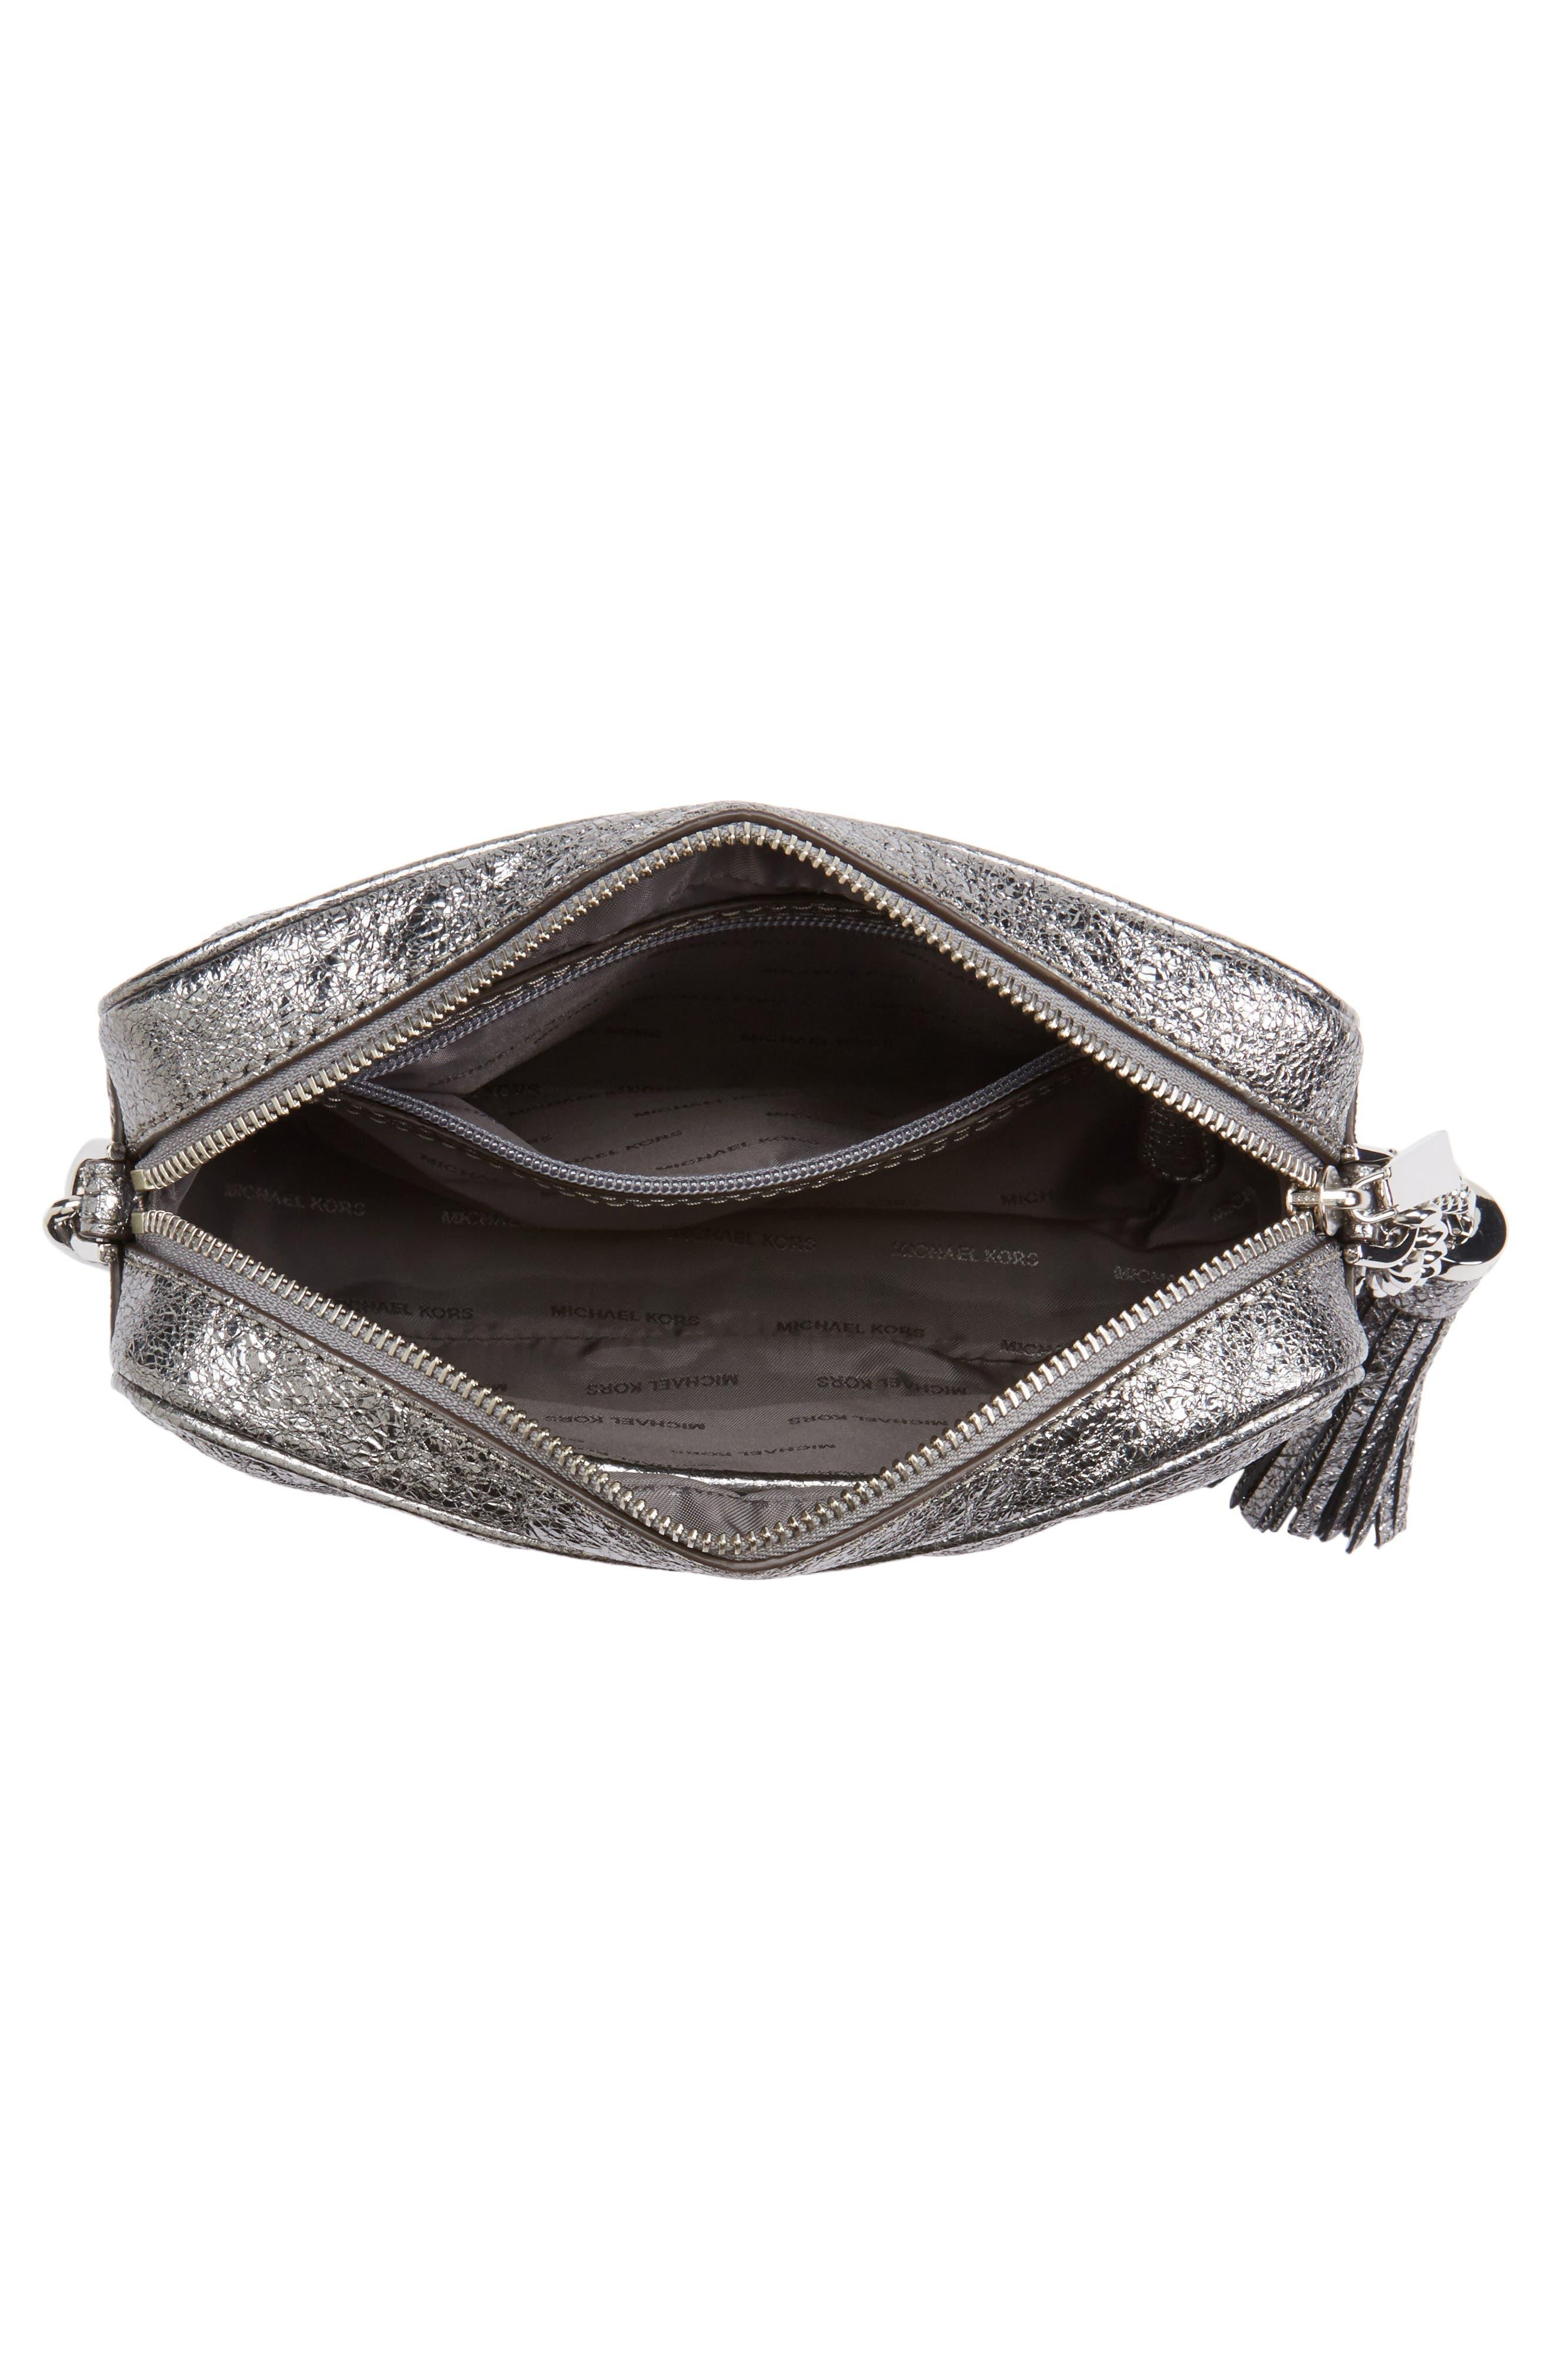 Medium Ginny Leather Camera Bag,                             Alternate thumbnail 4, color,                             074